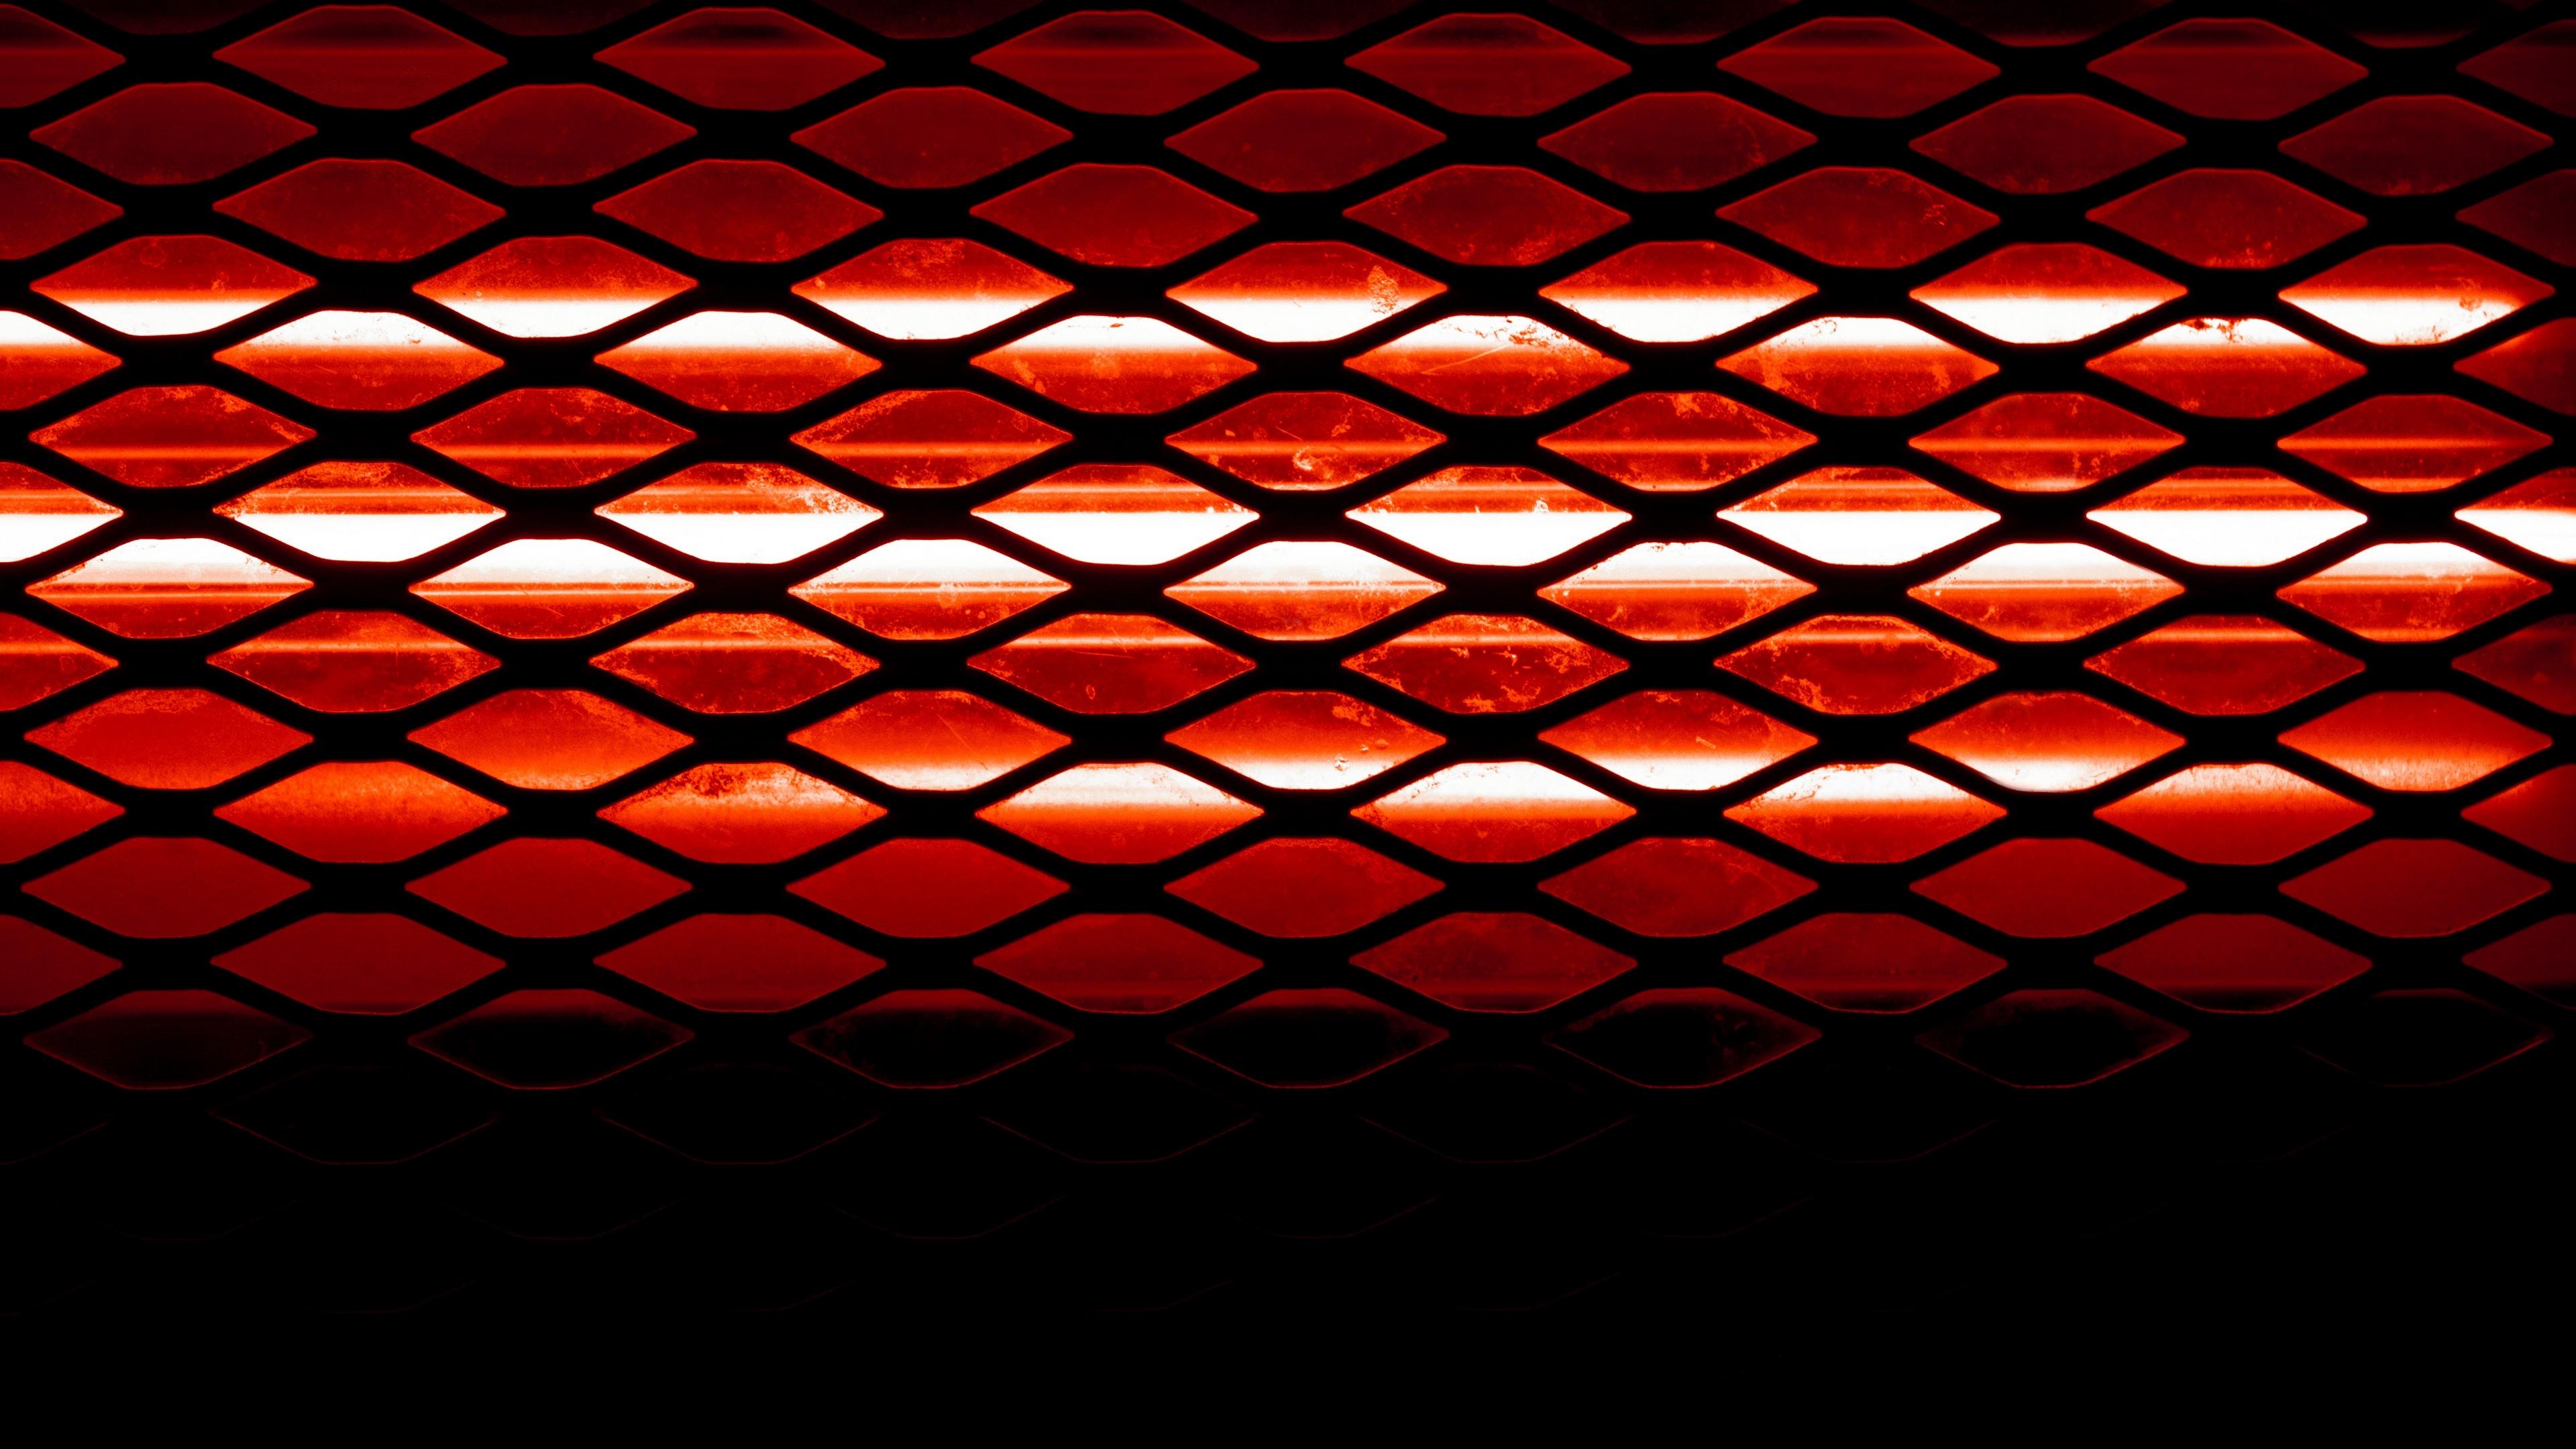 mesh light dark 4k 1540575045 - mesh, light, dark 4k - mesh, Light, Dark